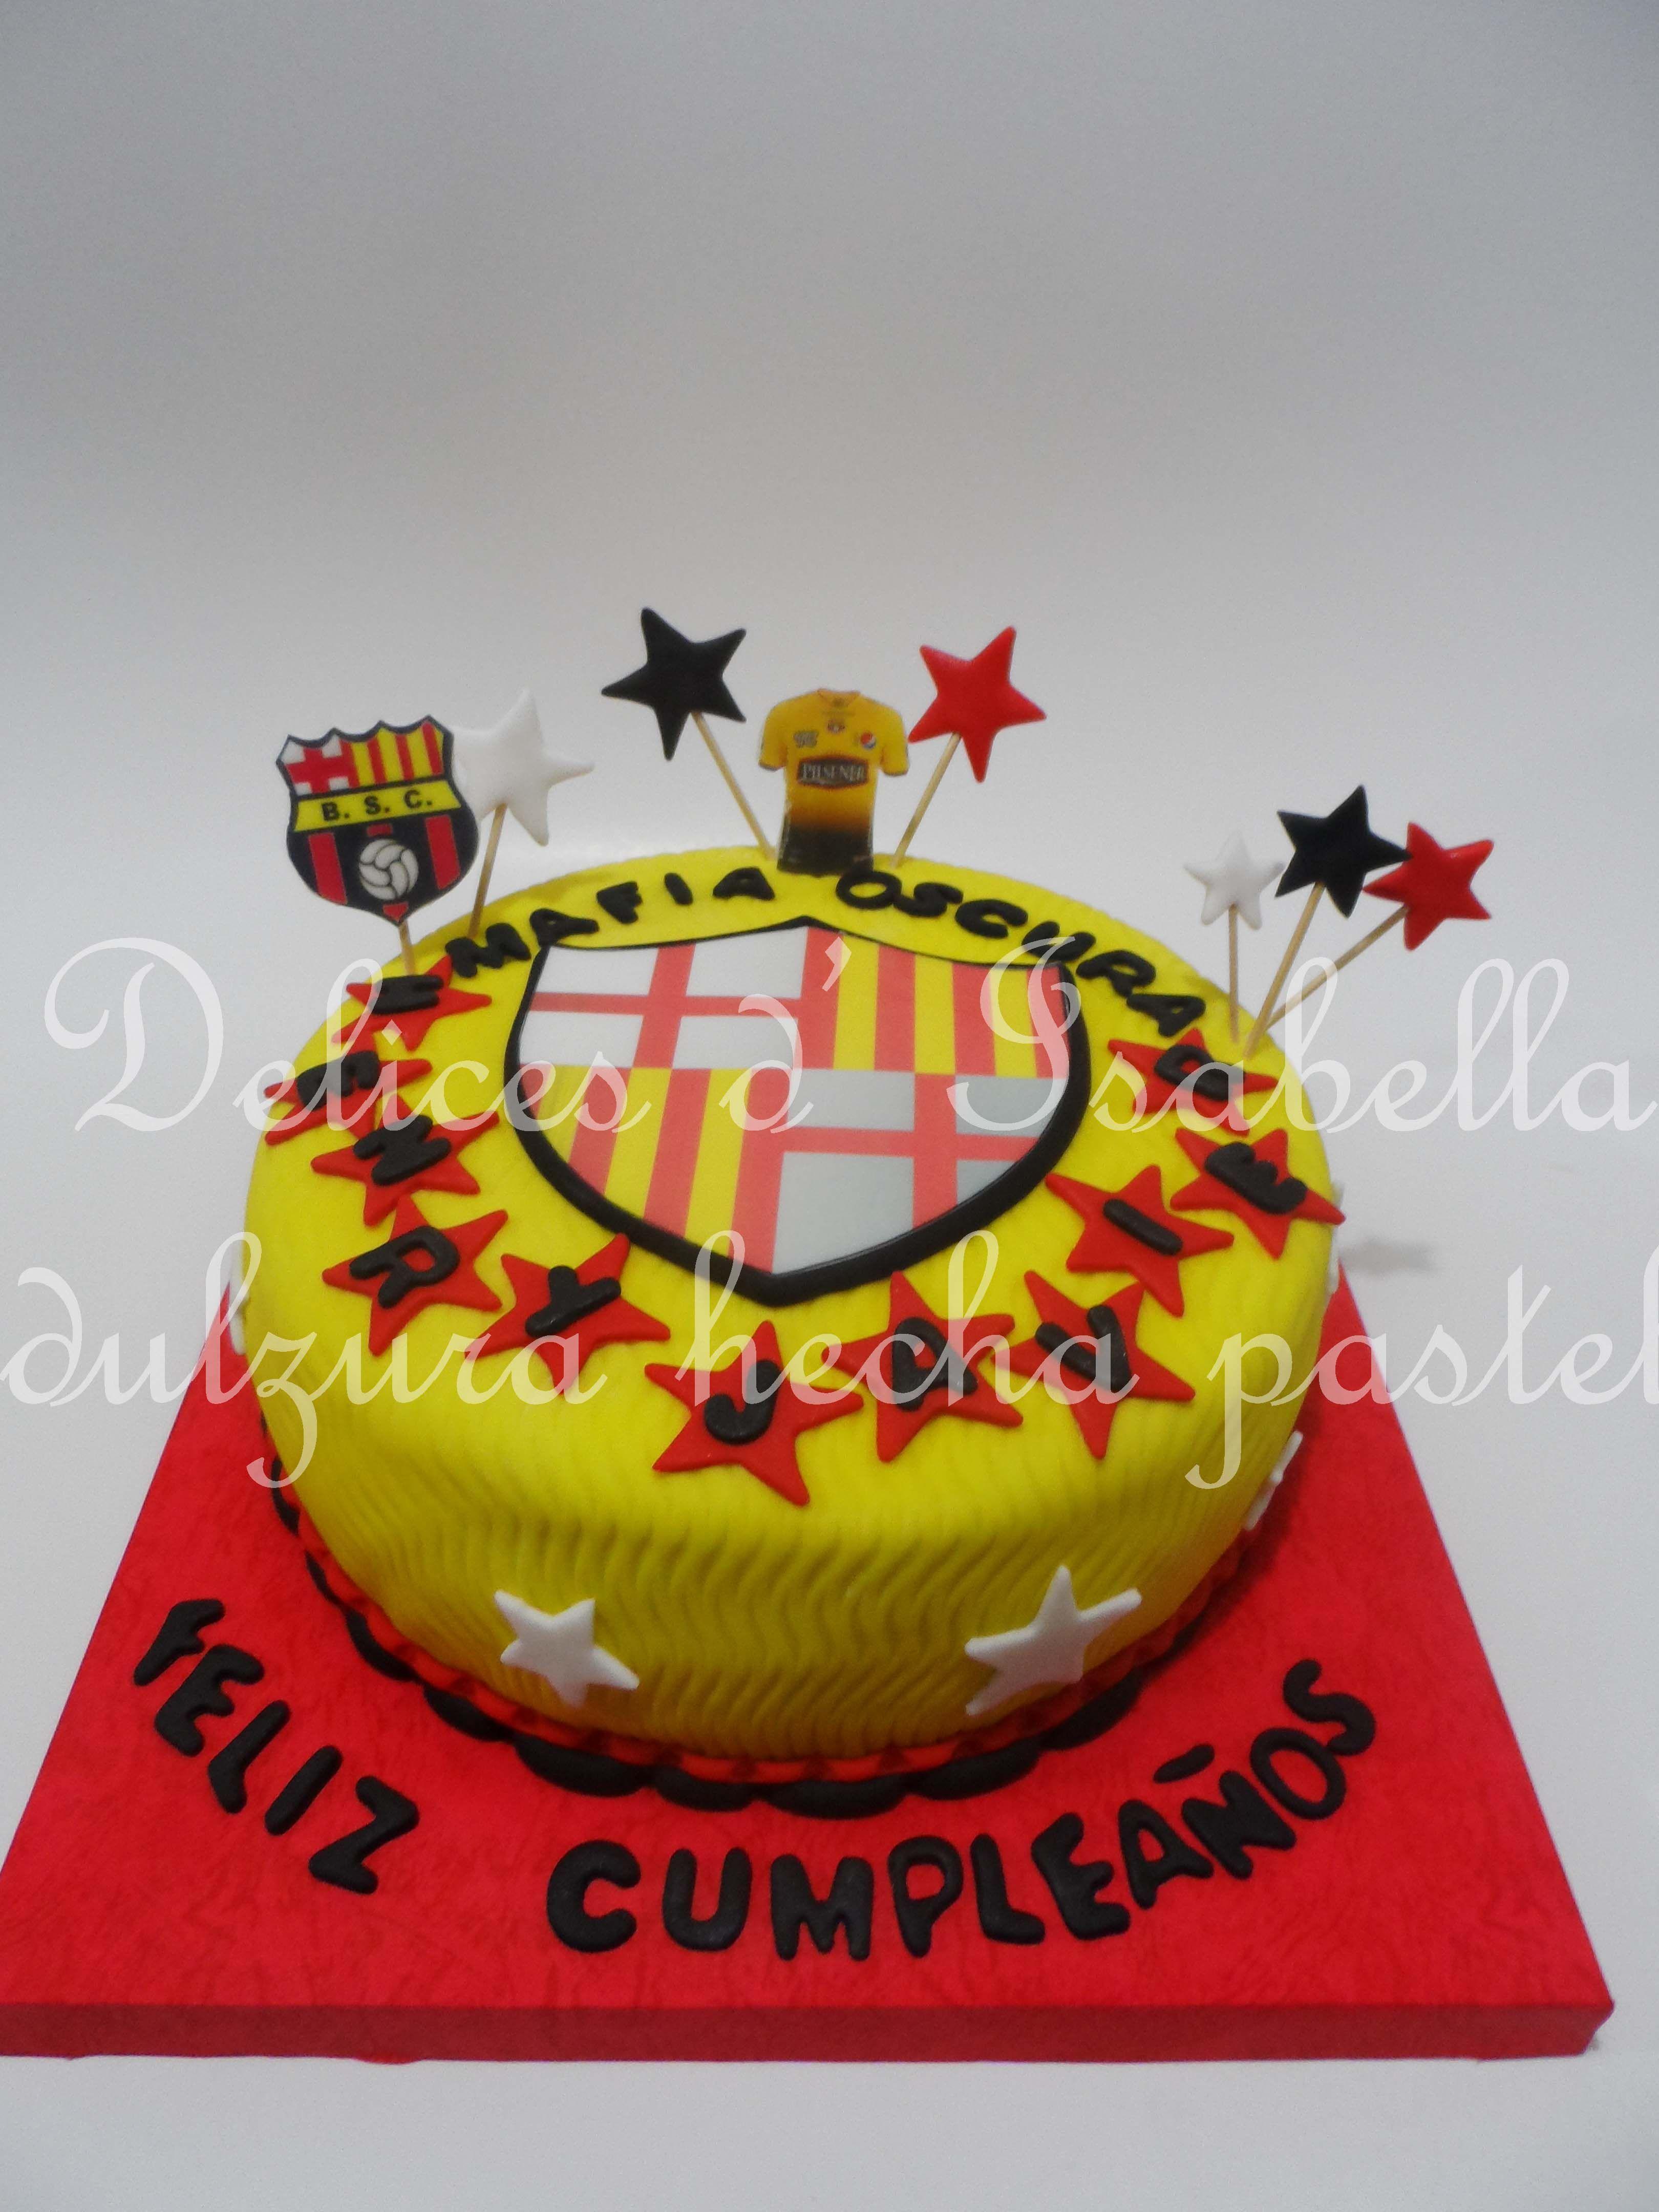 Torta Barcelona Ecuador Dulzura Hecha Pastel Tortas